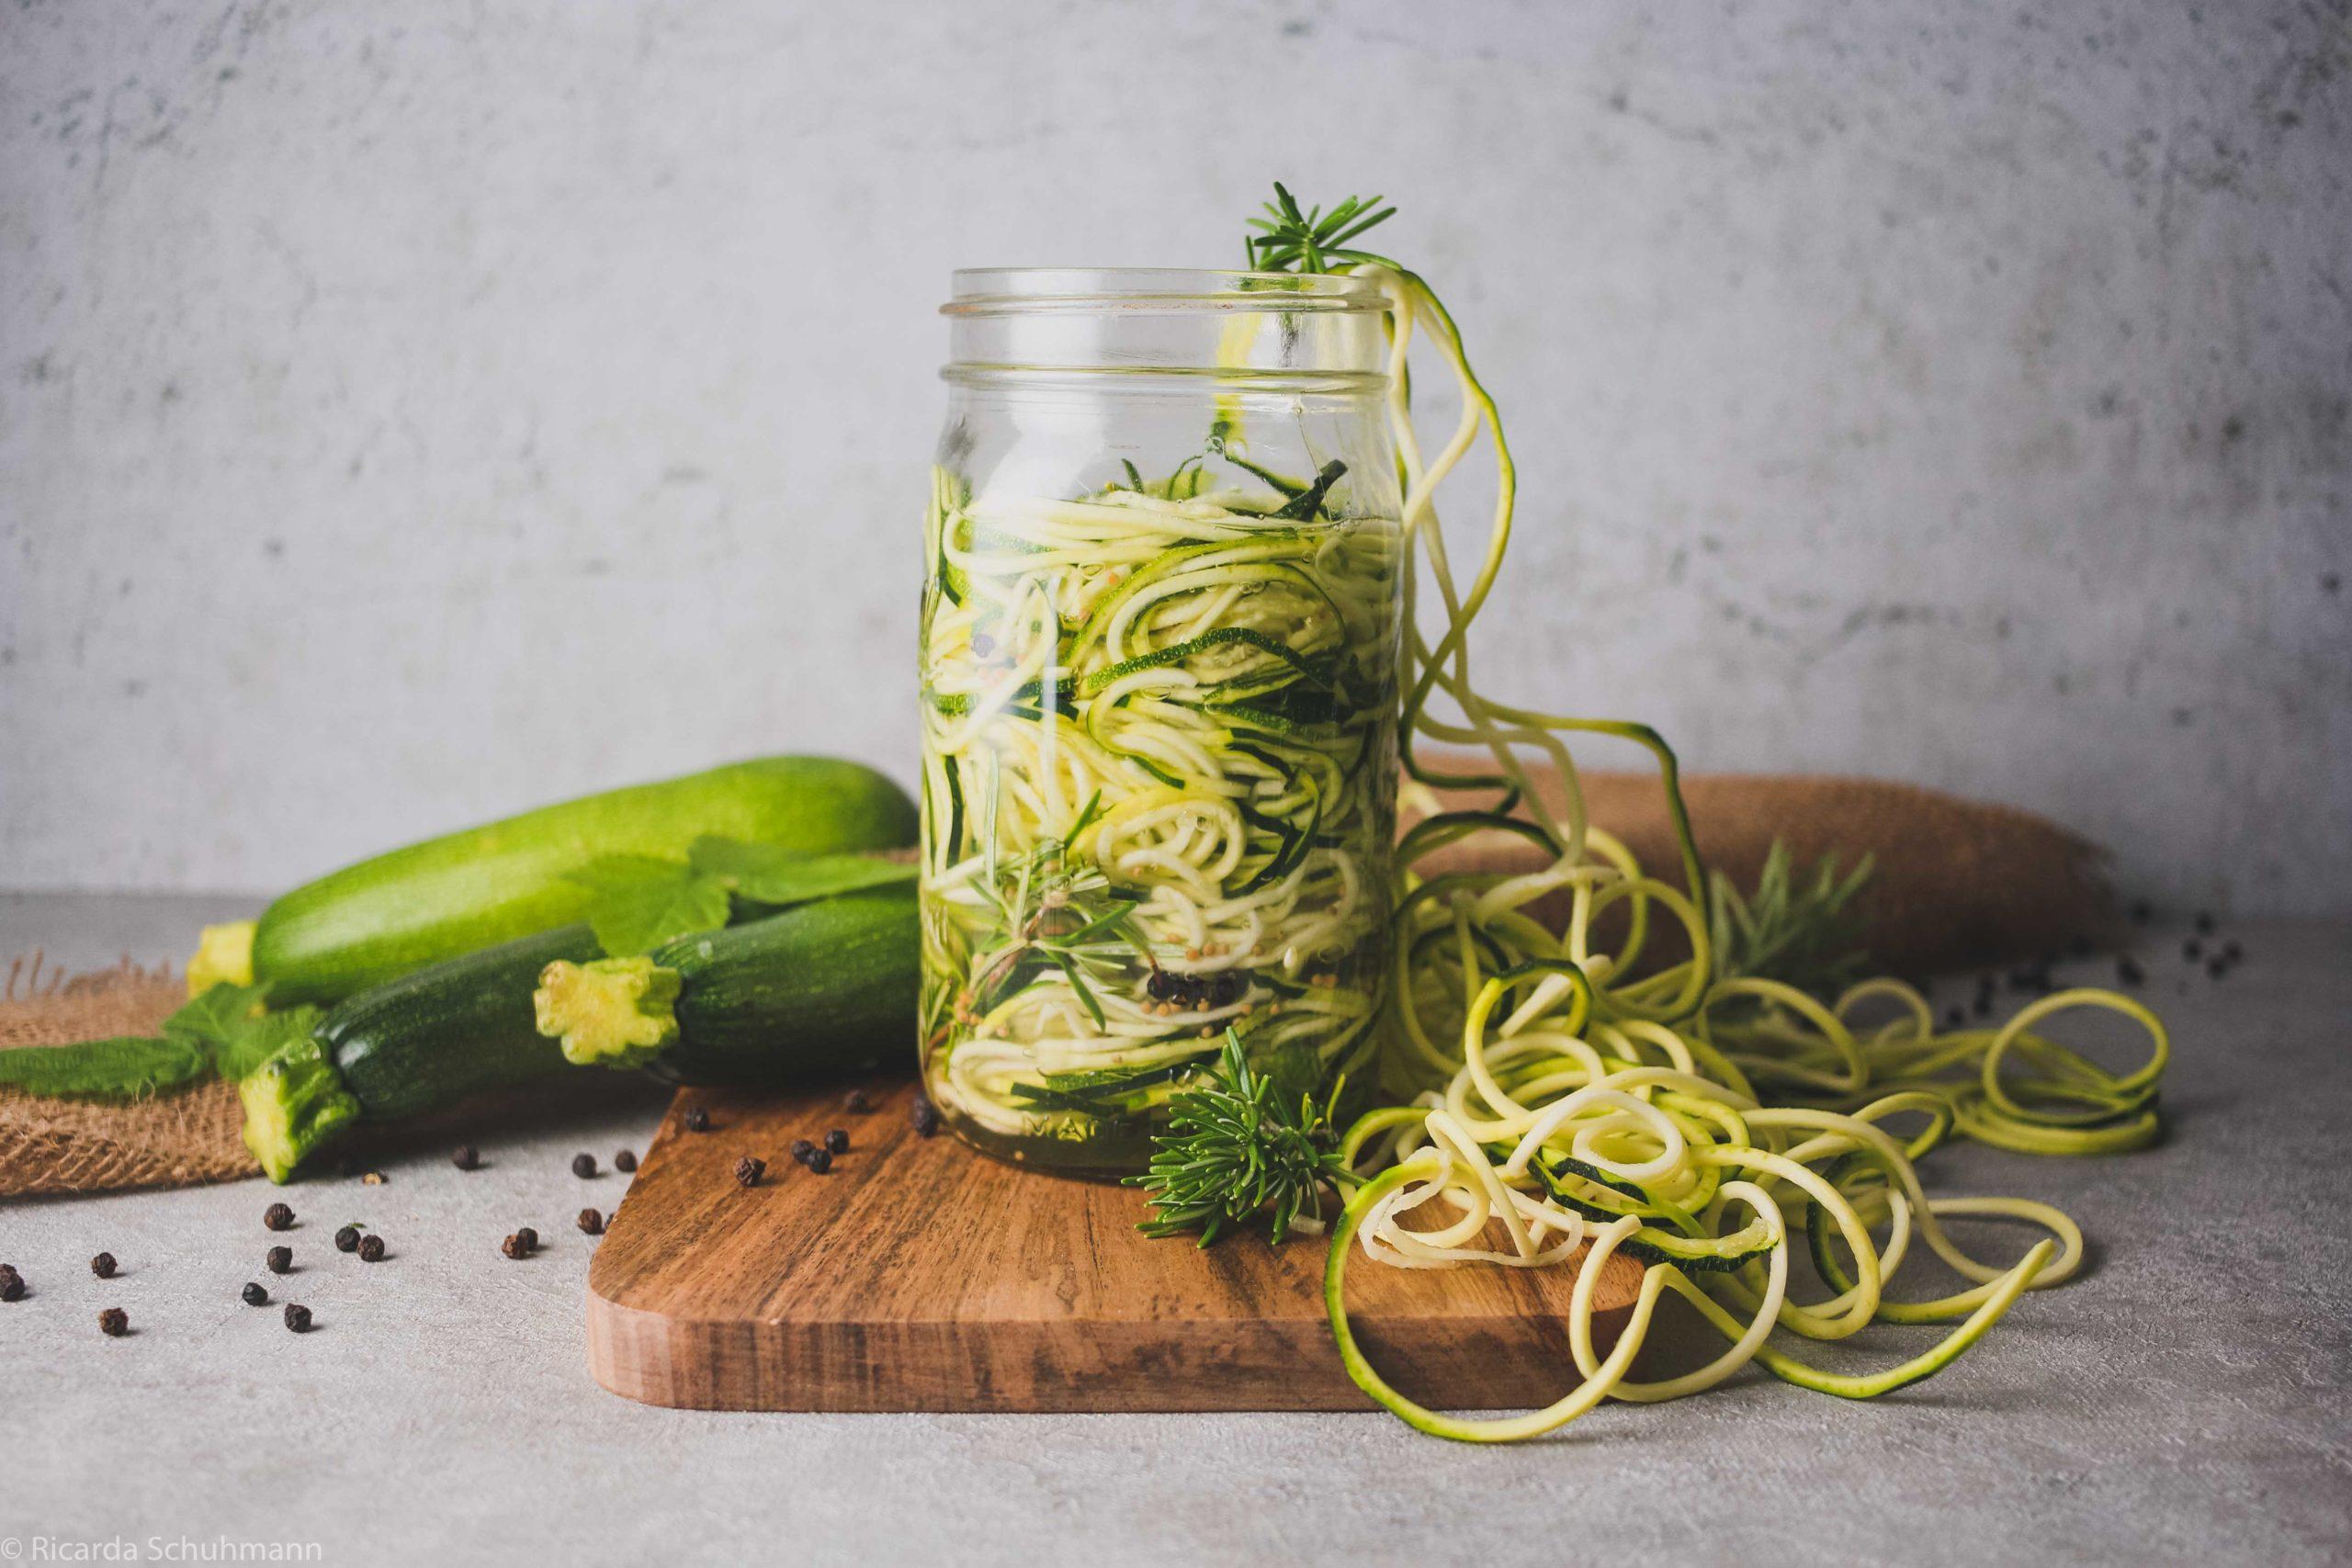 Fermentierte Zoodles – Zucchini-Nudeln im Glas